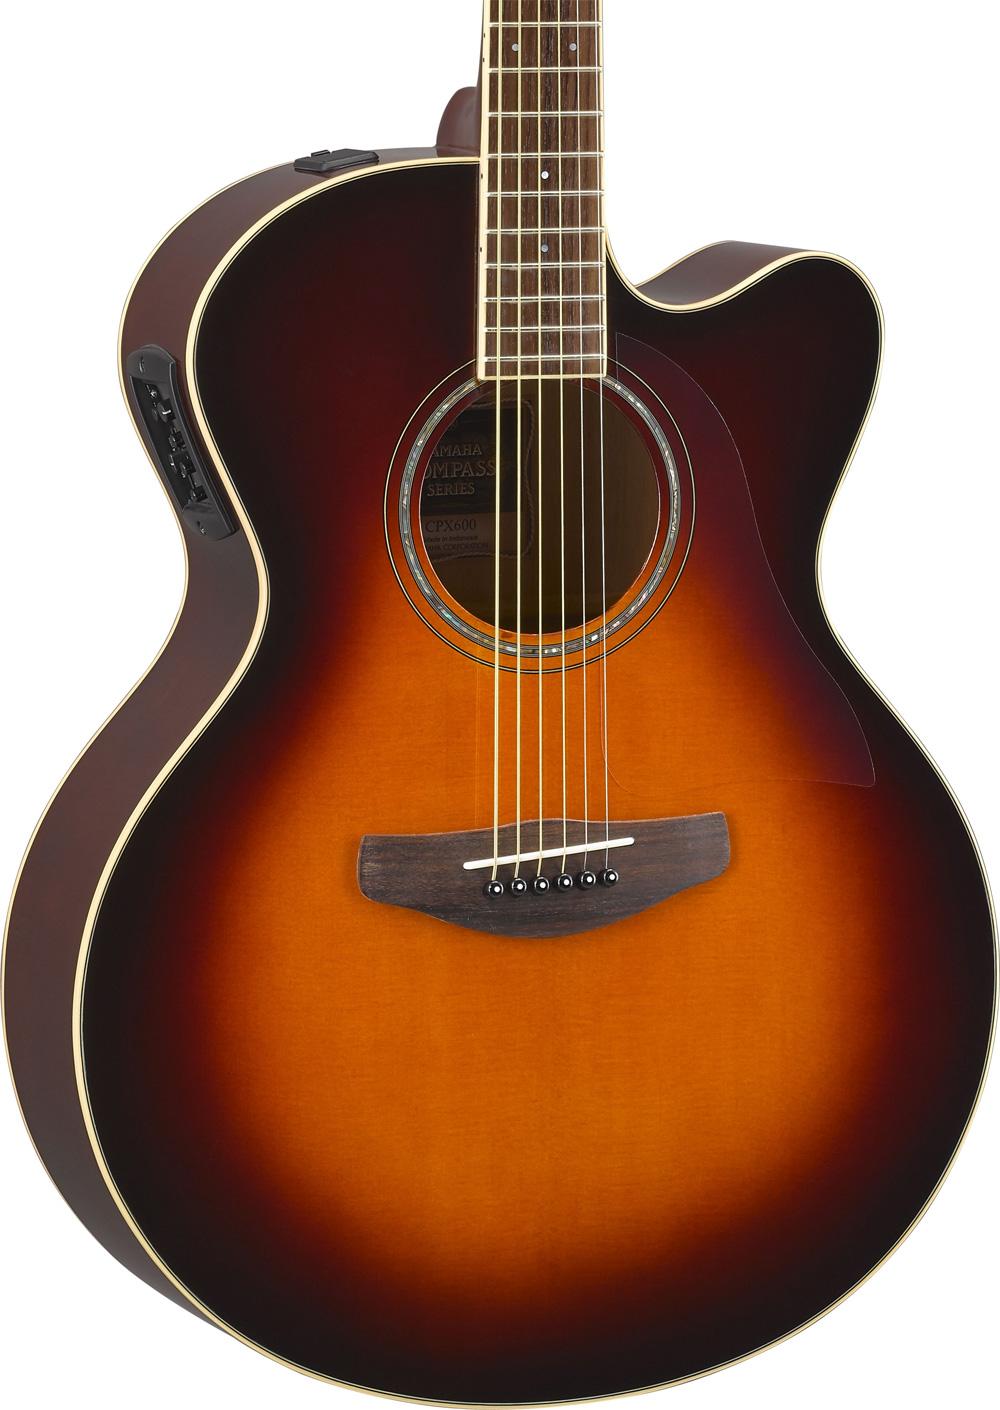 yamaha cpx600 ovs compass jumbo elektro akustik gitarre. Black Bedroom Furniture Sets. Home Design Ideas